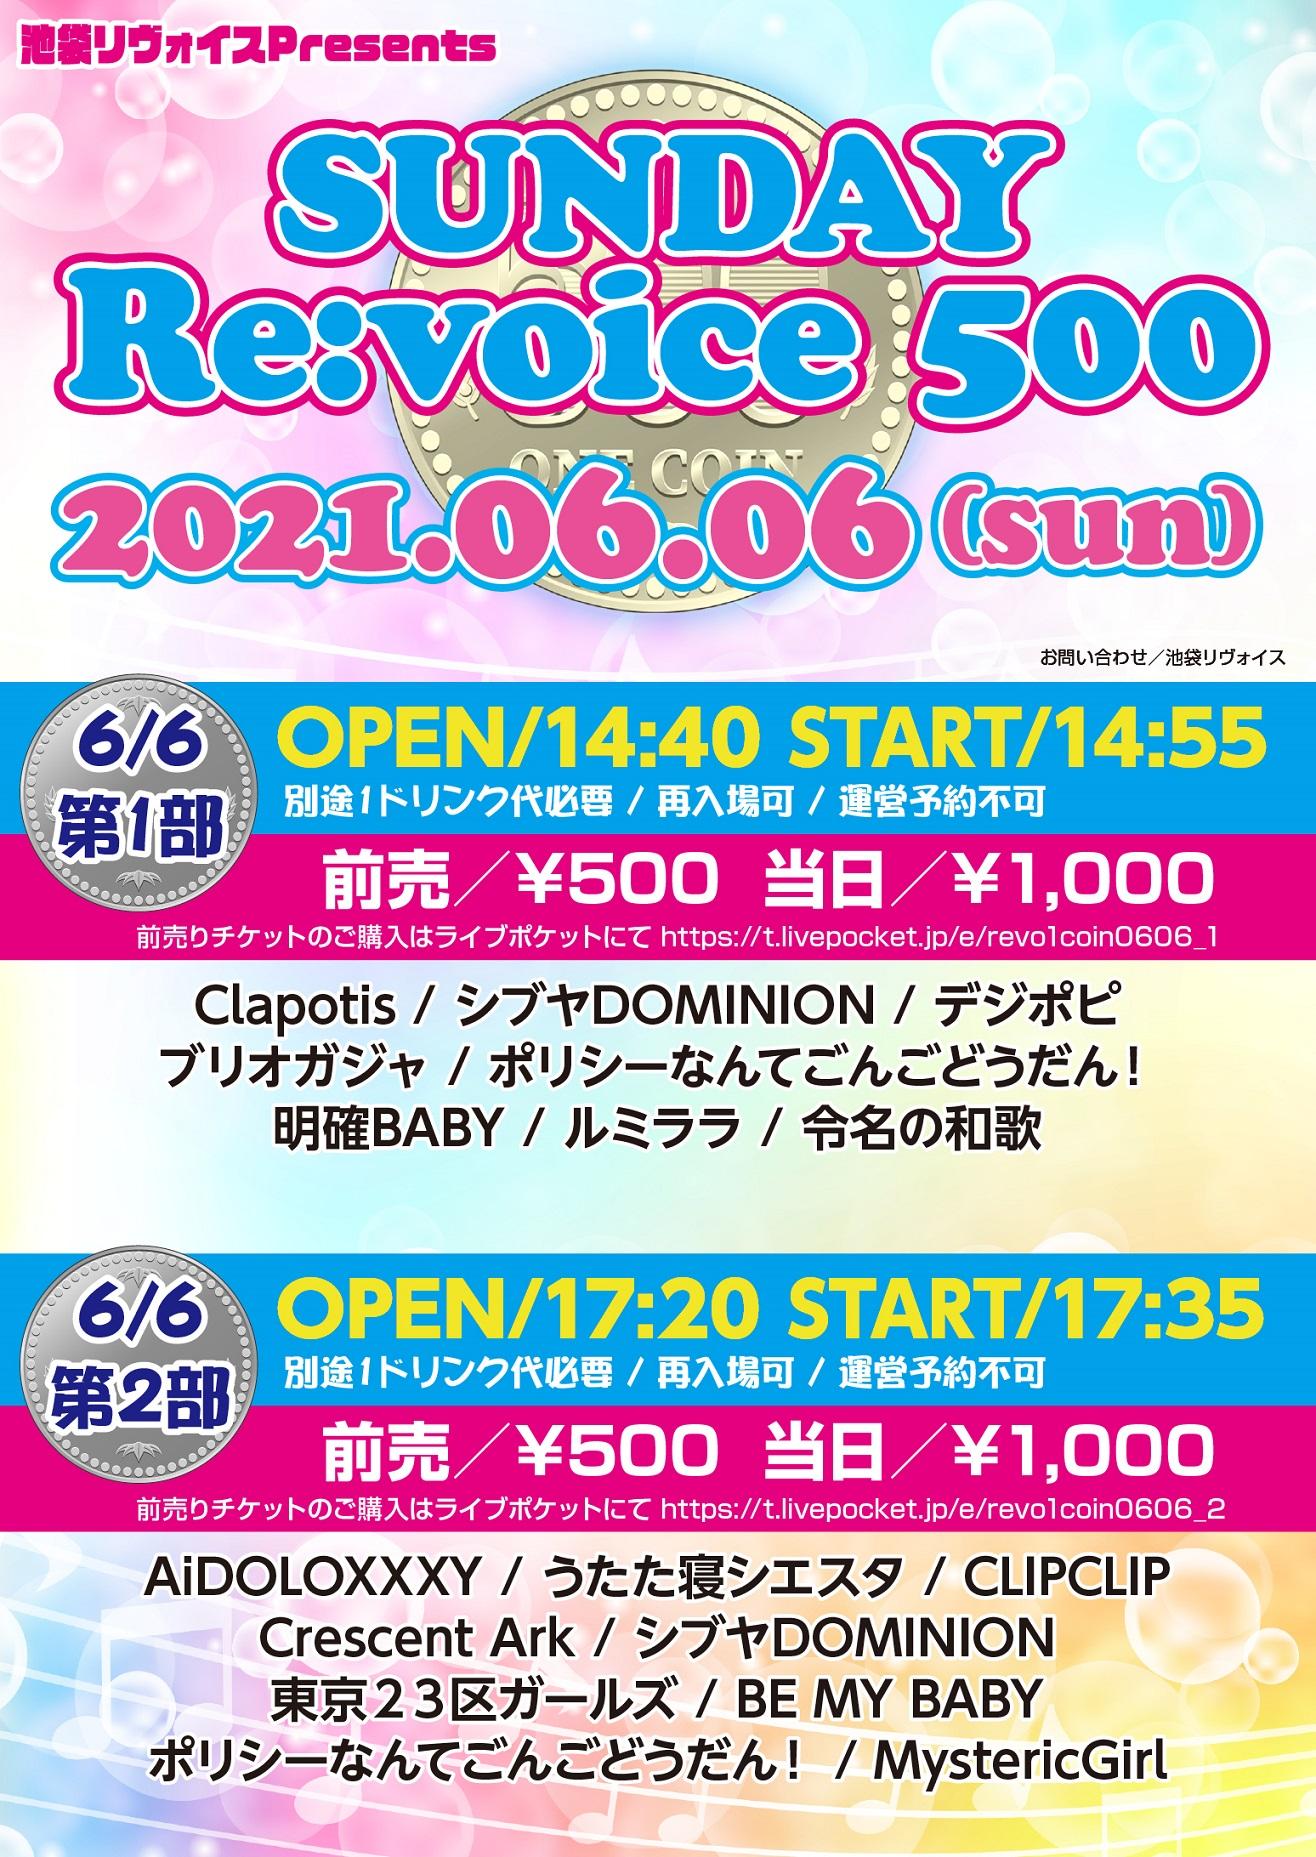 【第二部】SUNDAY Re:voice 500